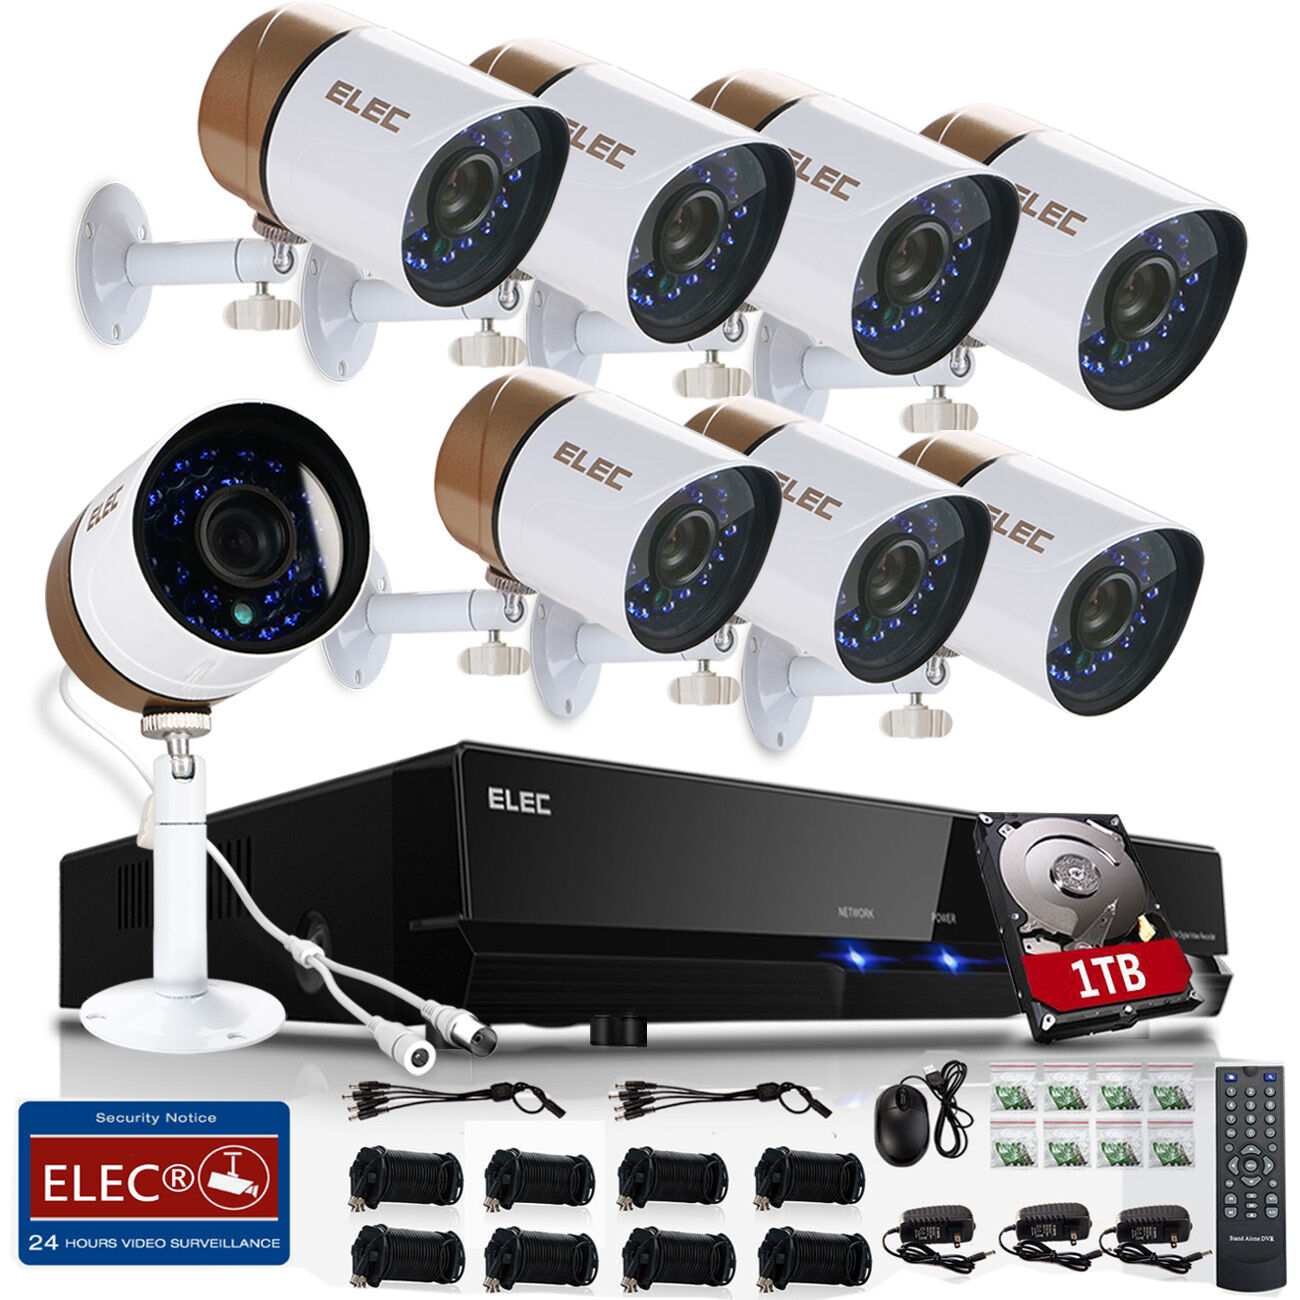 ELEC 8CH 1080P HDMI 1500TVL DVR CCTV IR-Cut Home Security Camera System 1TB HDD